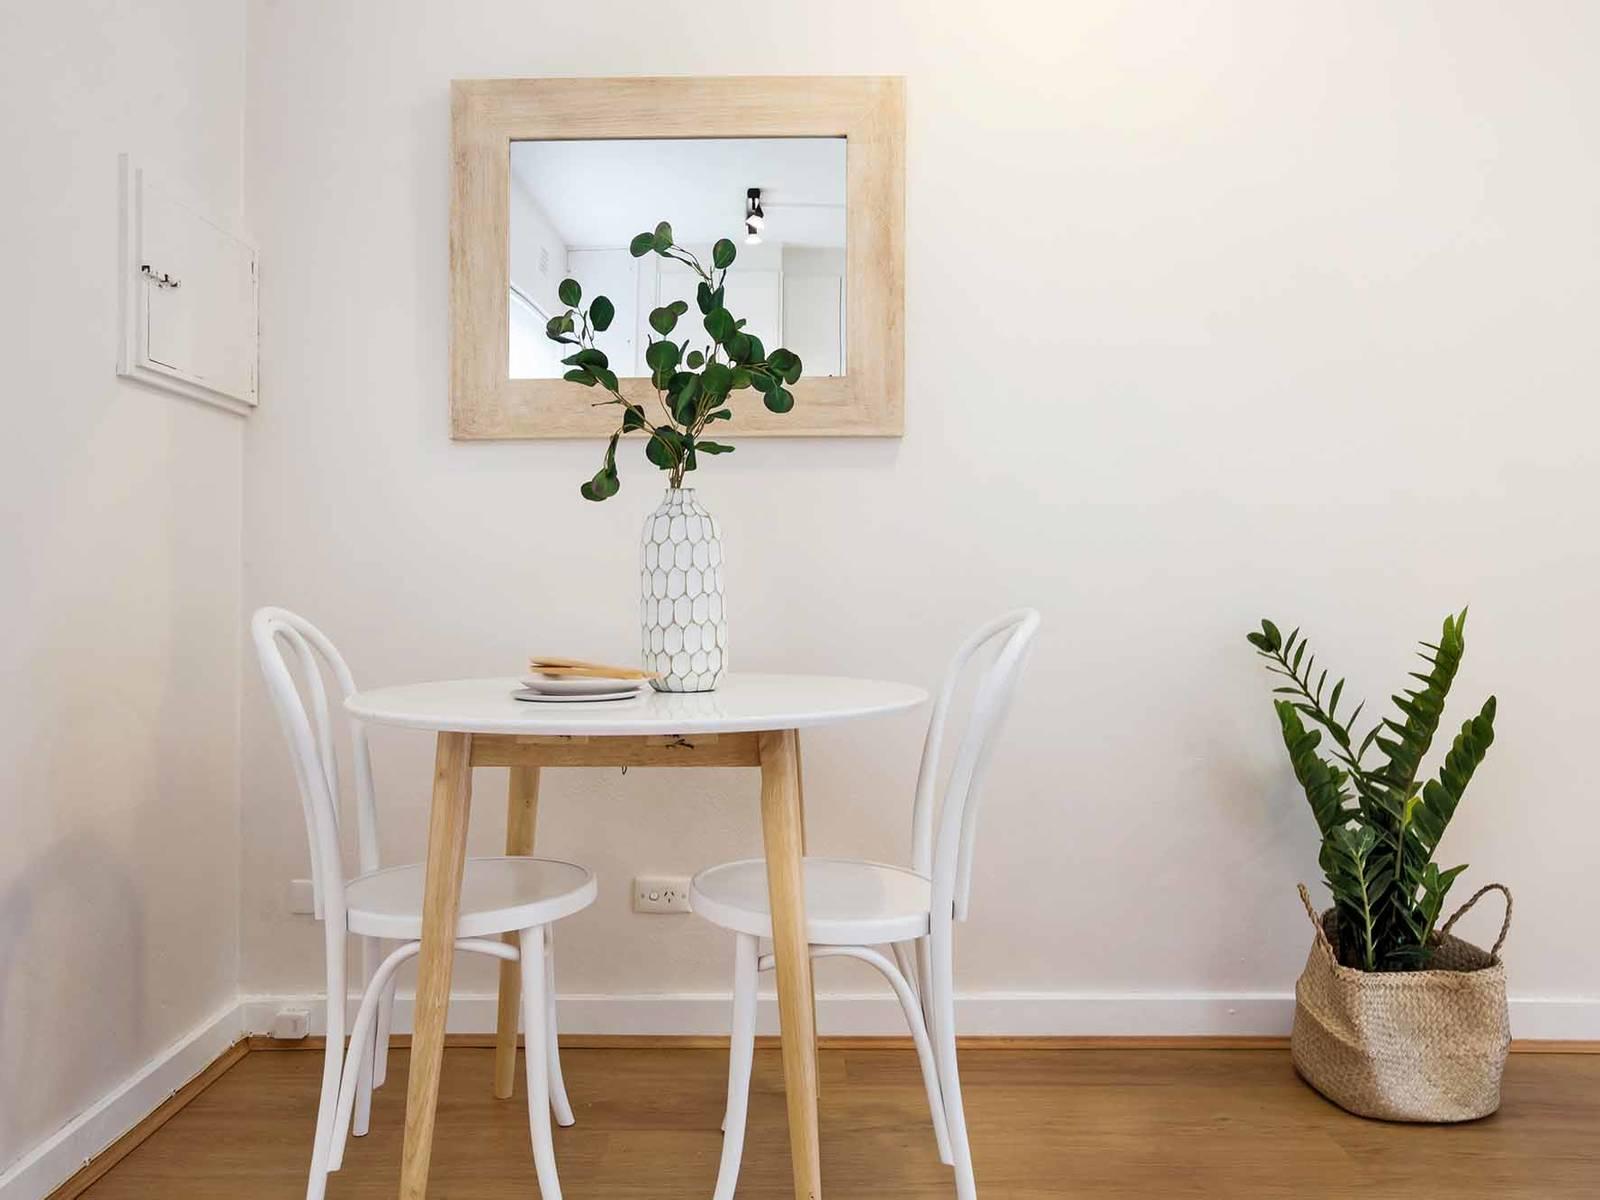 3 19 Rosalind Street Cammeray Nsw 2062 Apartment Sold Marriottlane Com Au